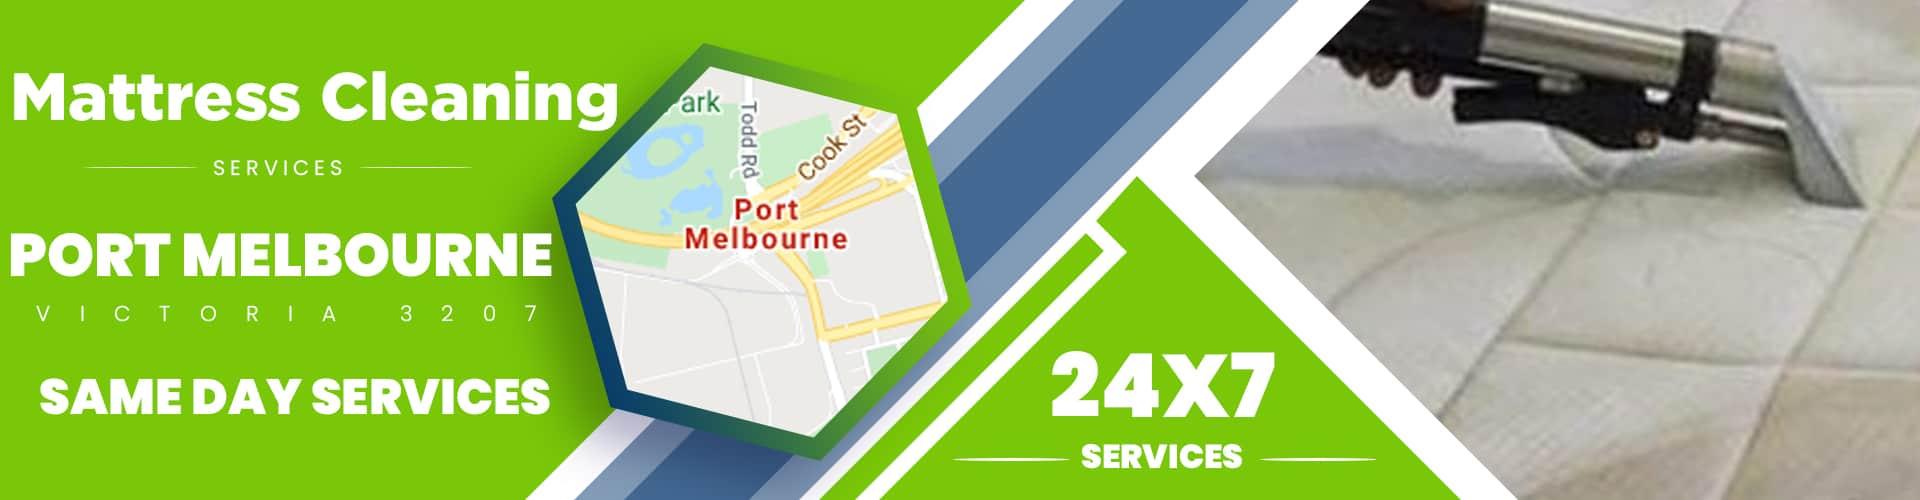 Mattress Cleaning Port Melbourne